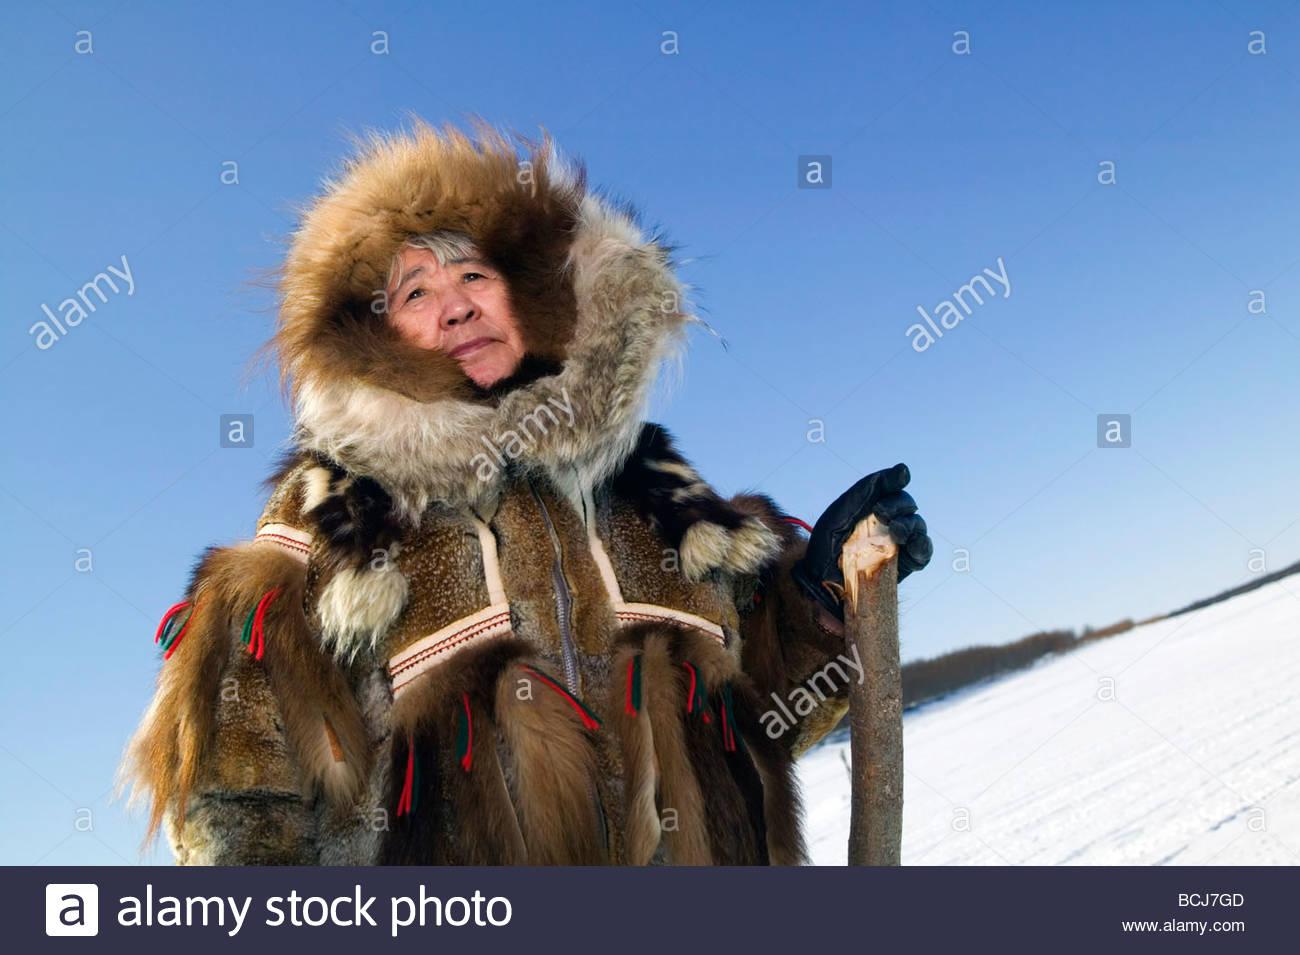 Female Yupik elder in traditional fur parka she made on frozen Kuskokwim River Akiachak Alaska - Stock Image